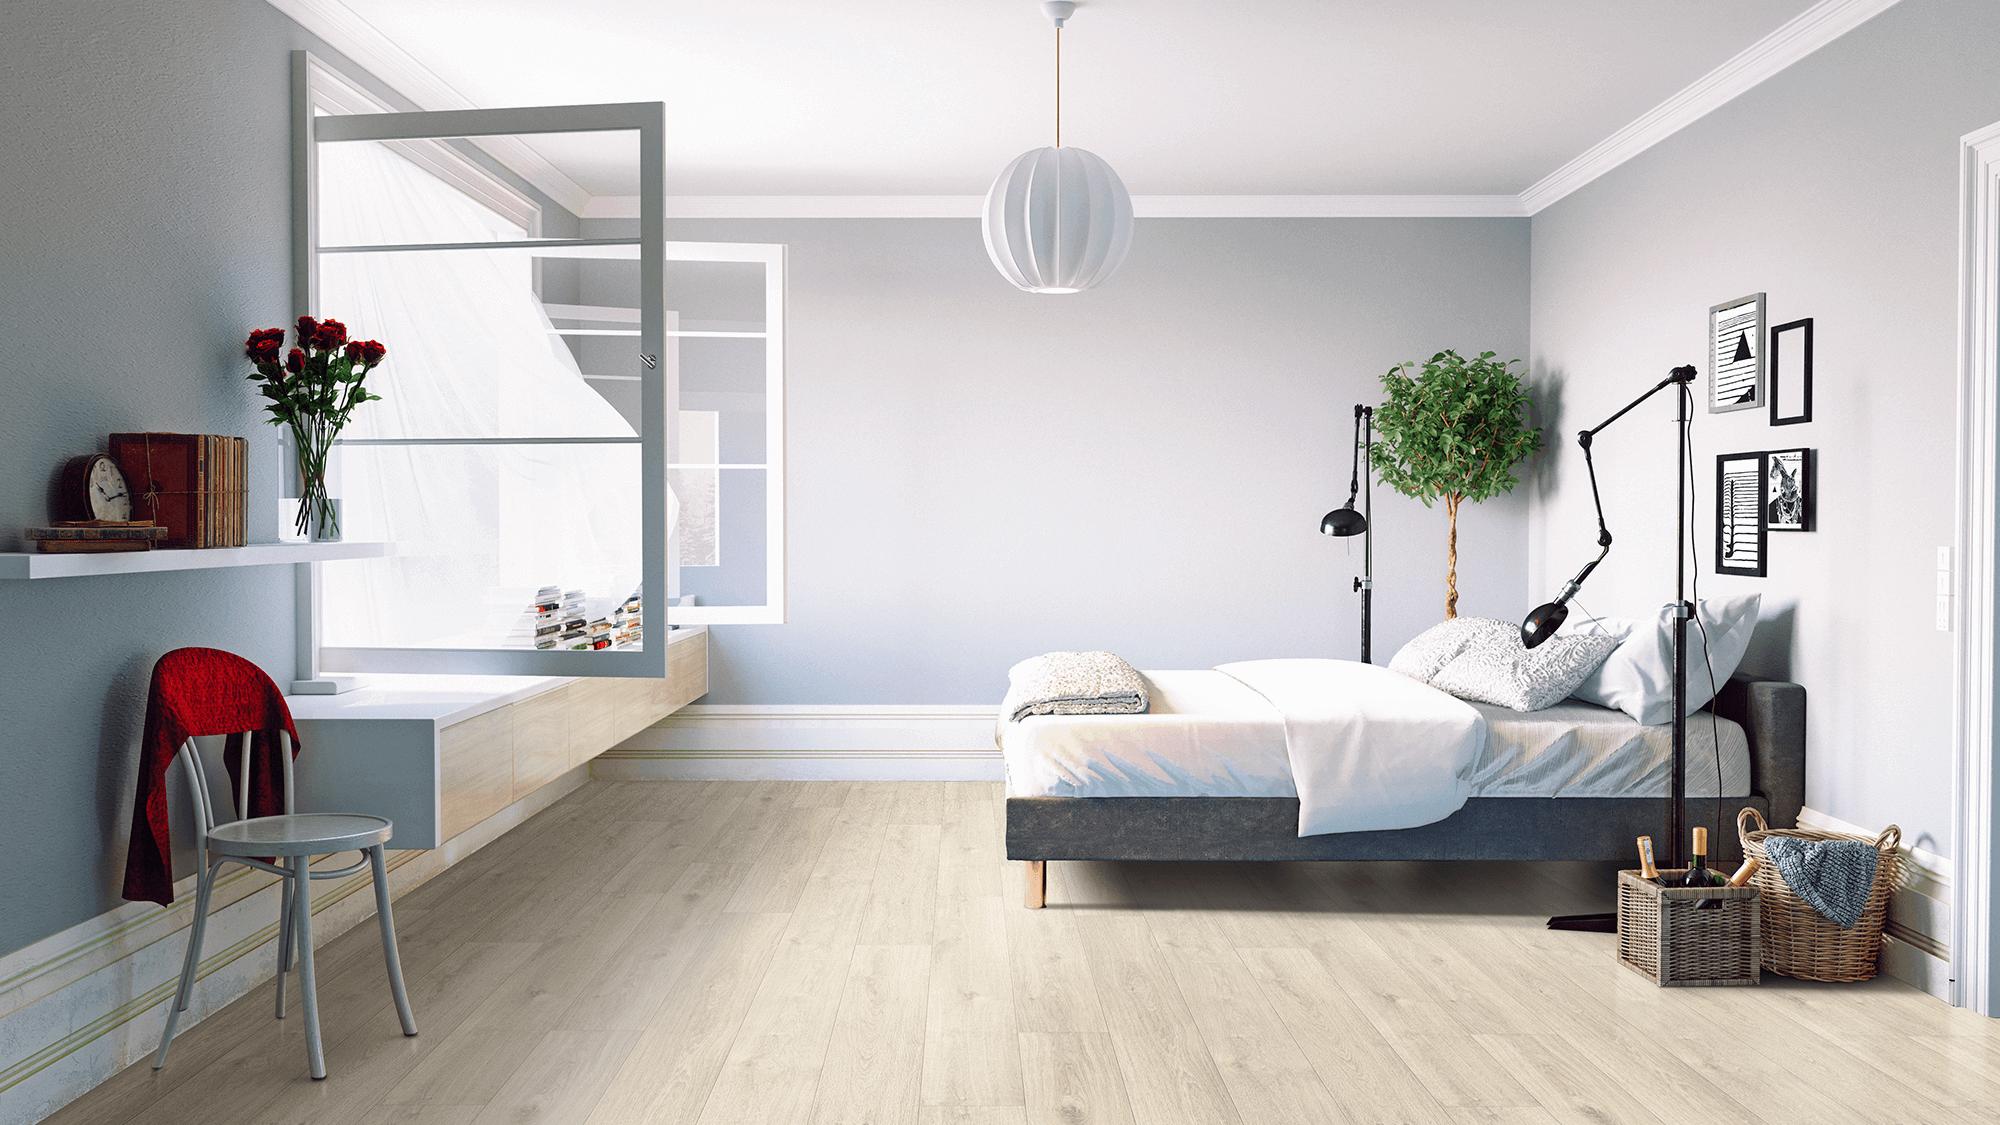 Home Unilin, Unilin Laminate Flooring